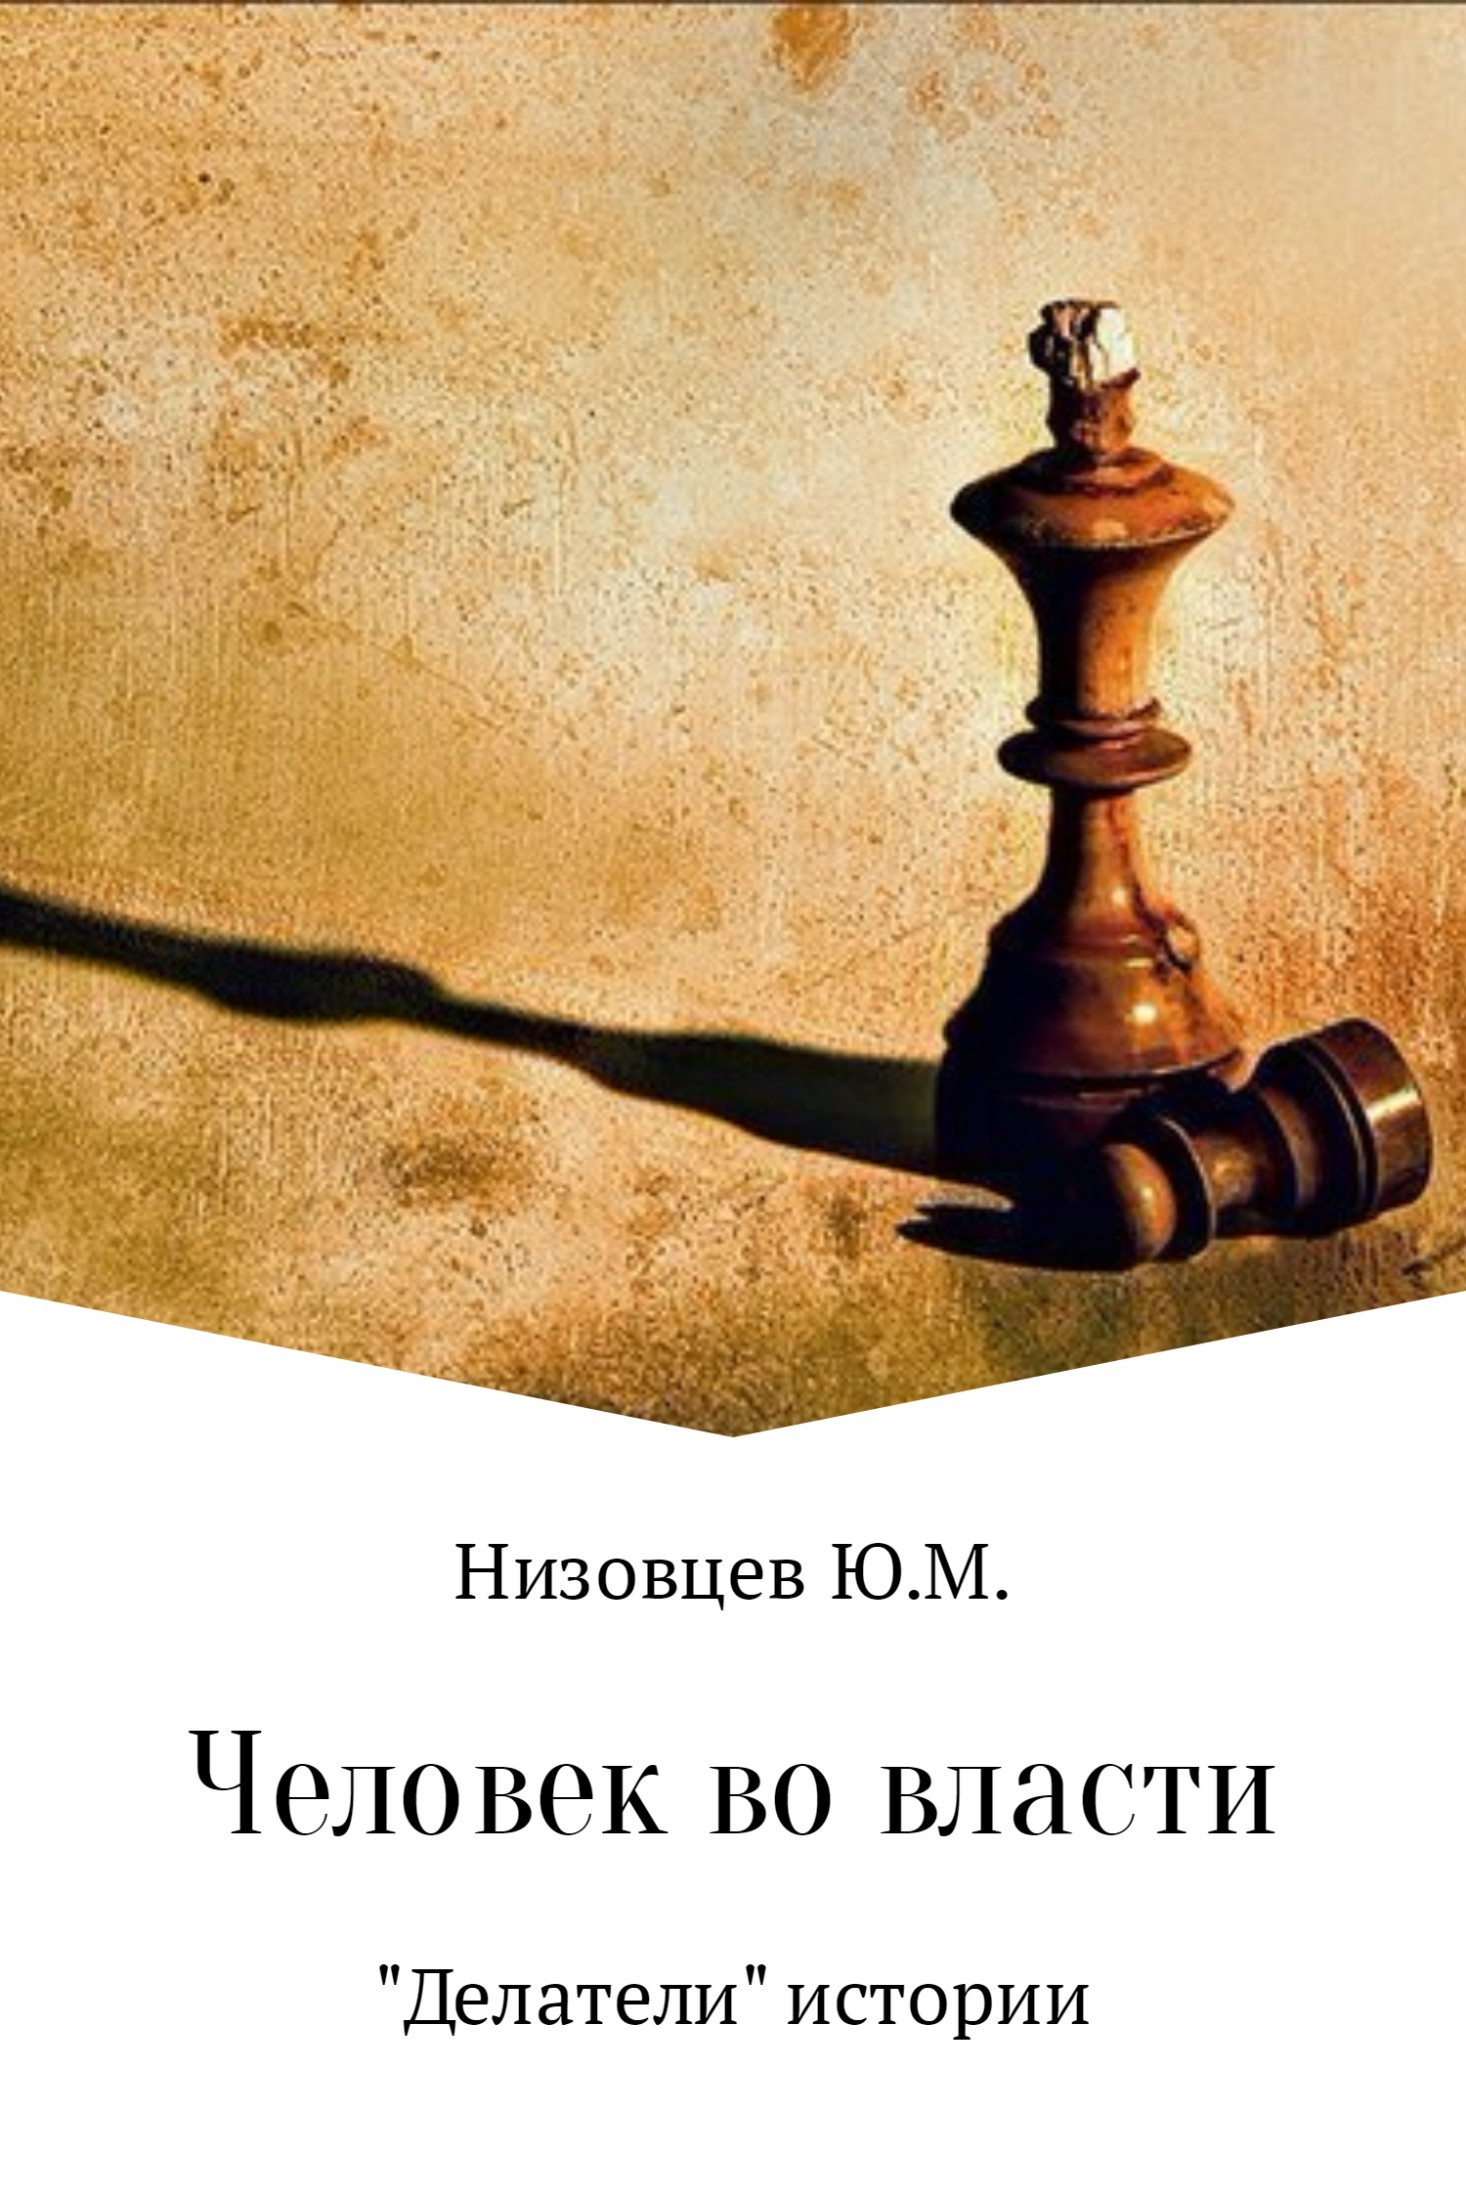 Юрий Низовцев - Человек во власти